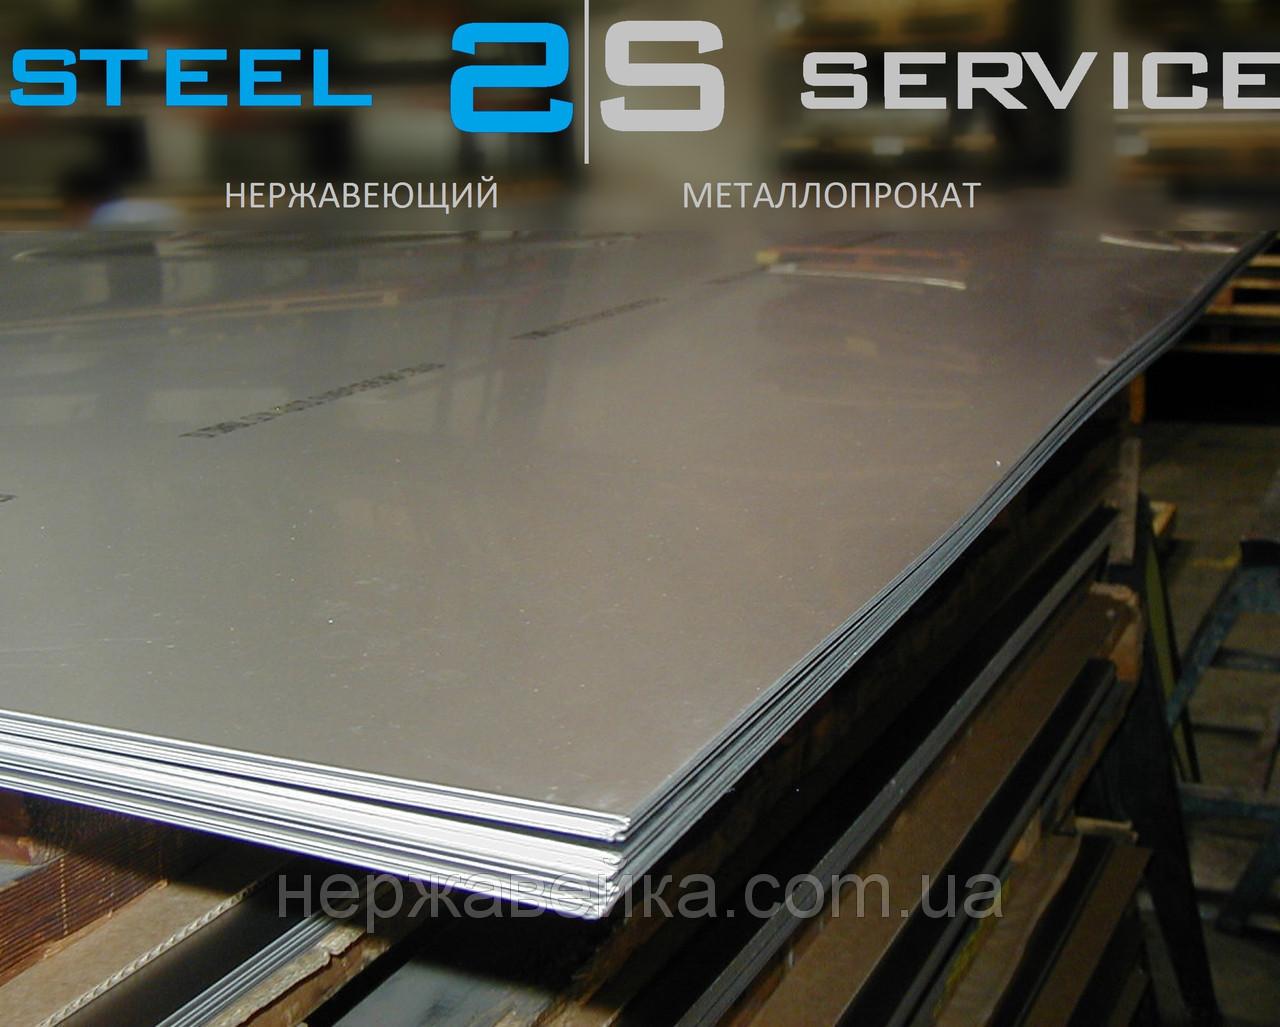 Нержавеющий лист 2х1250х2500мм AISI 430(12Х17) 4N - шлифованный, технический